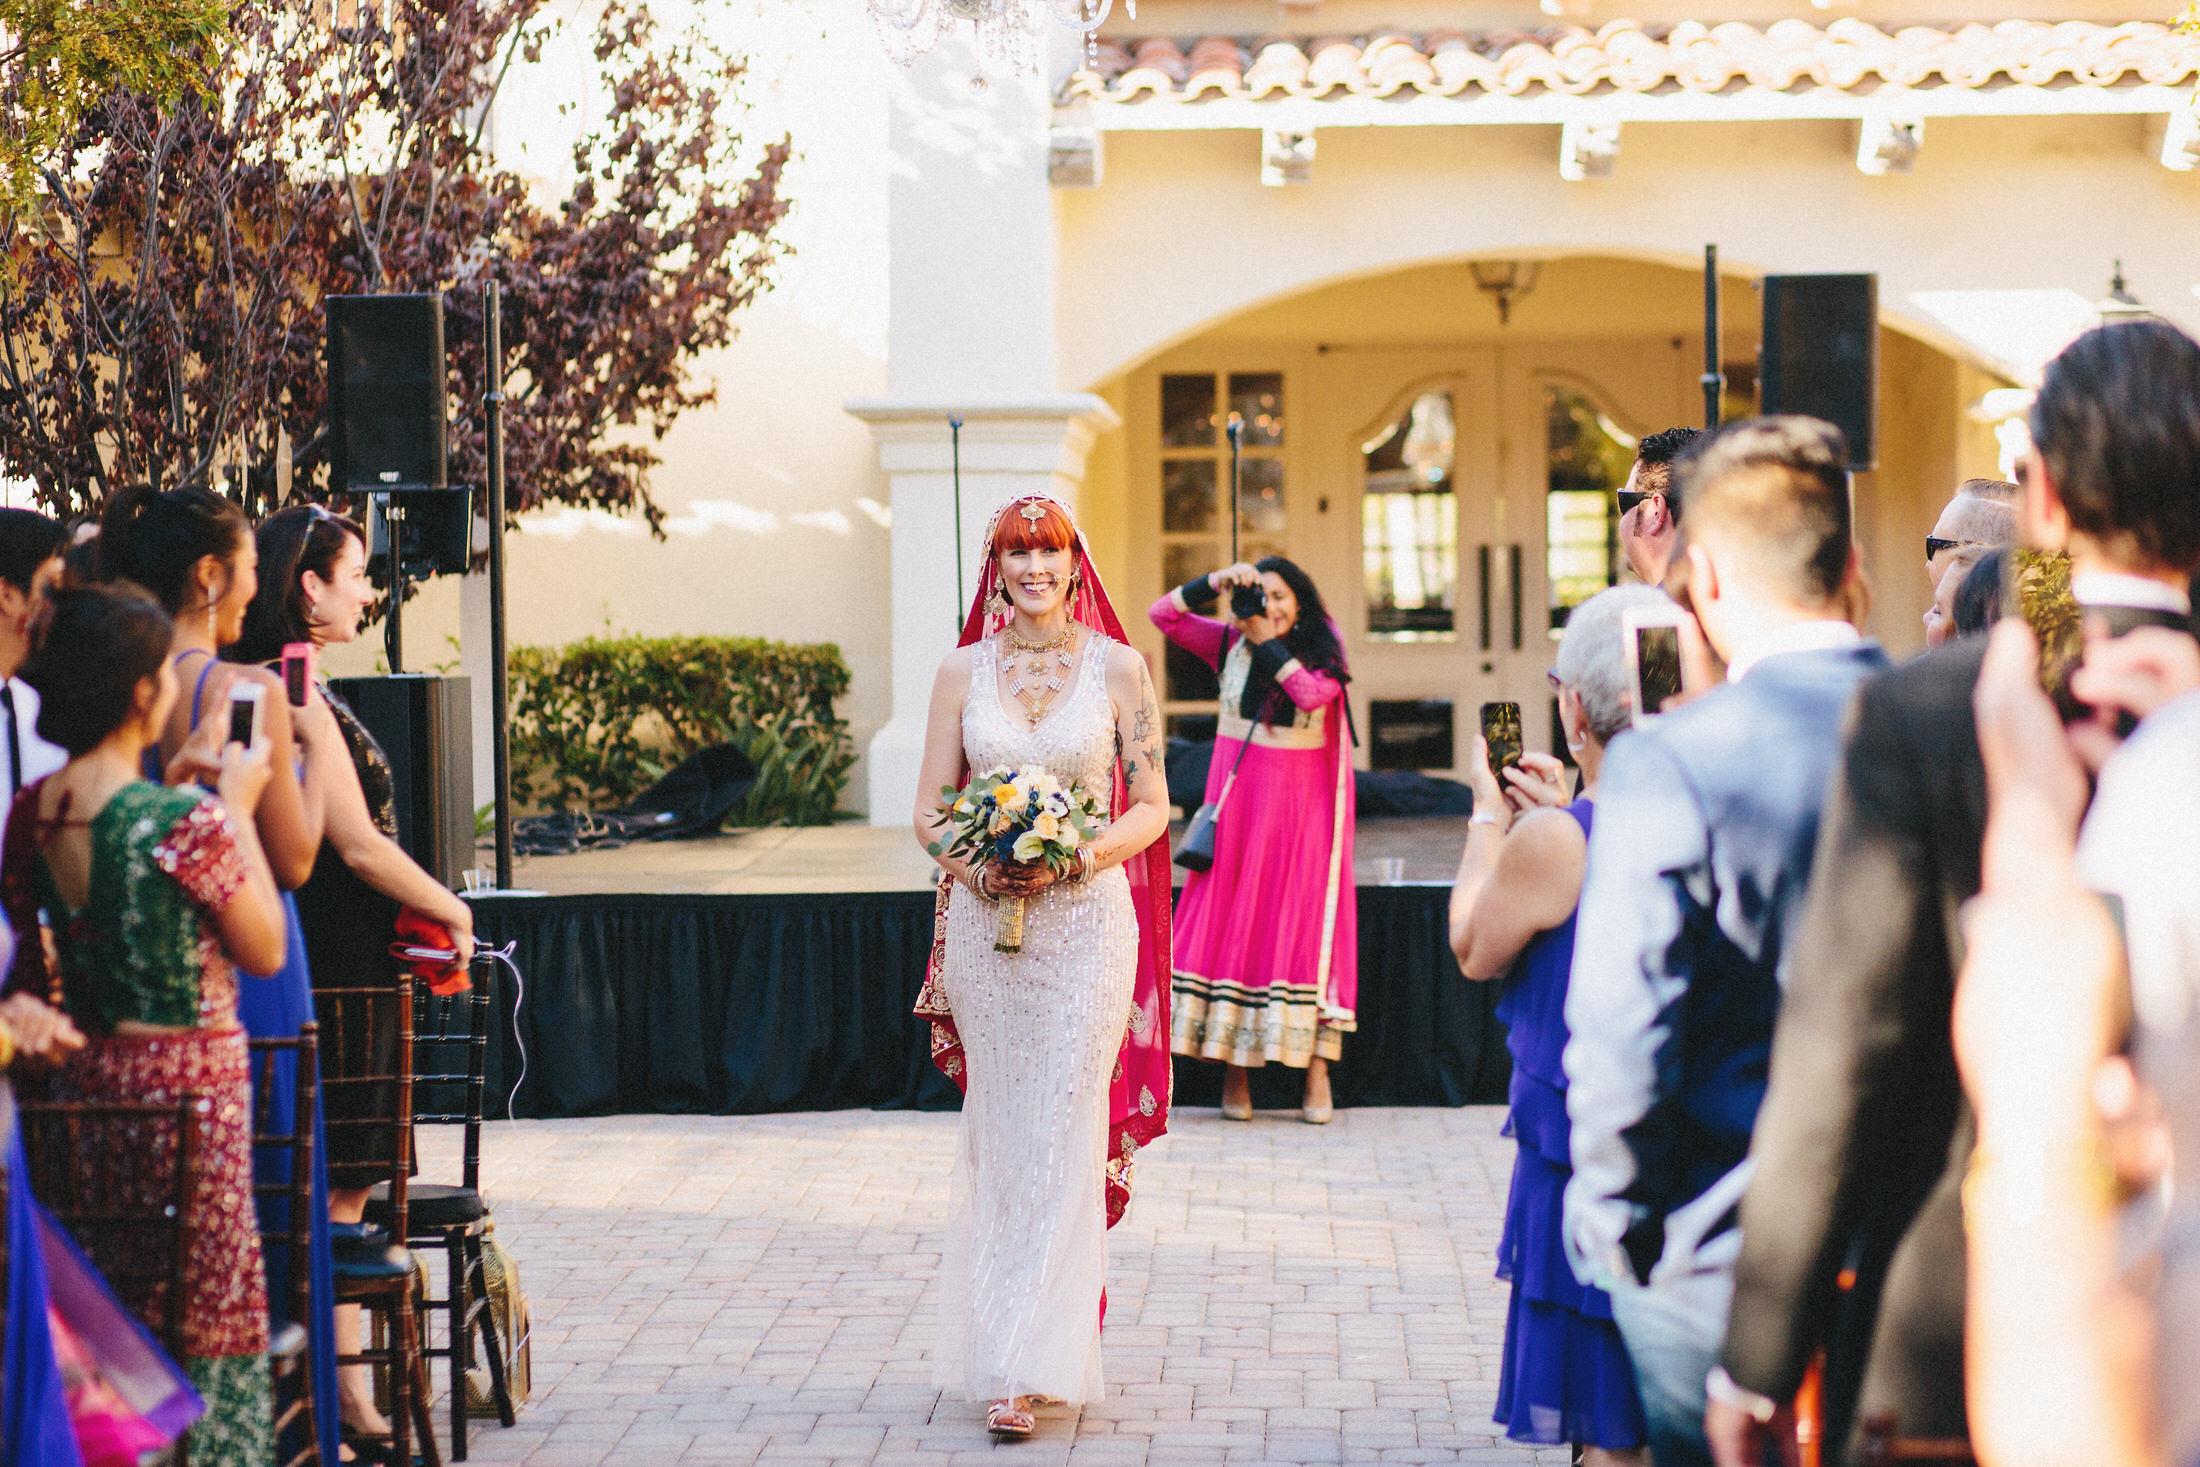 Modern-Indian-Serra-Plaza-wedding-053.jpg